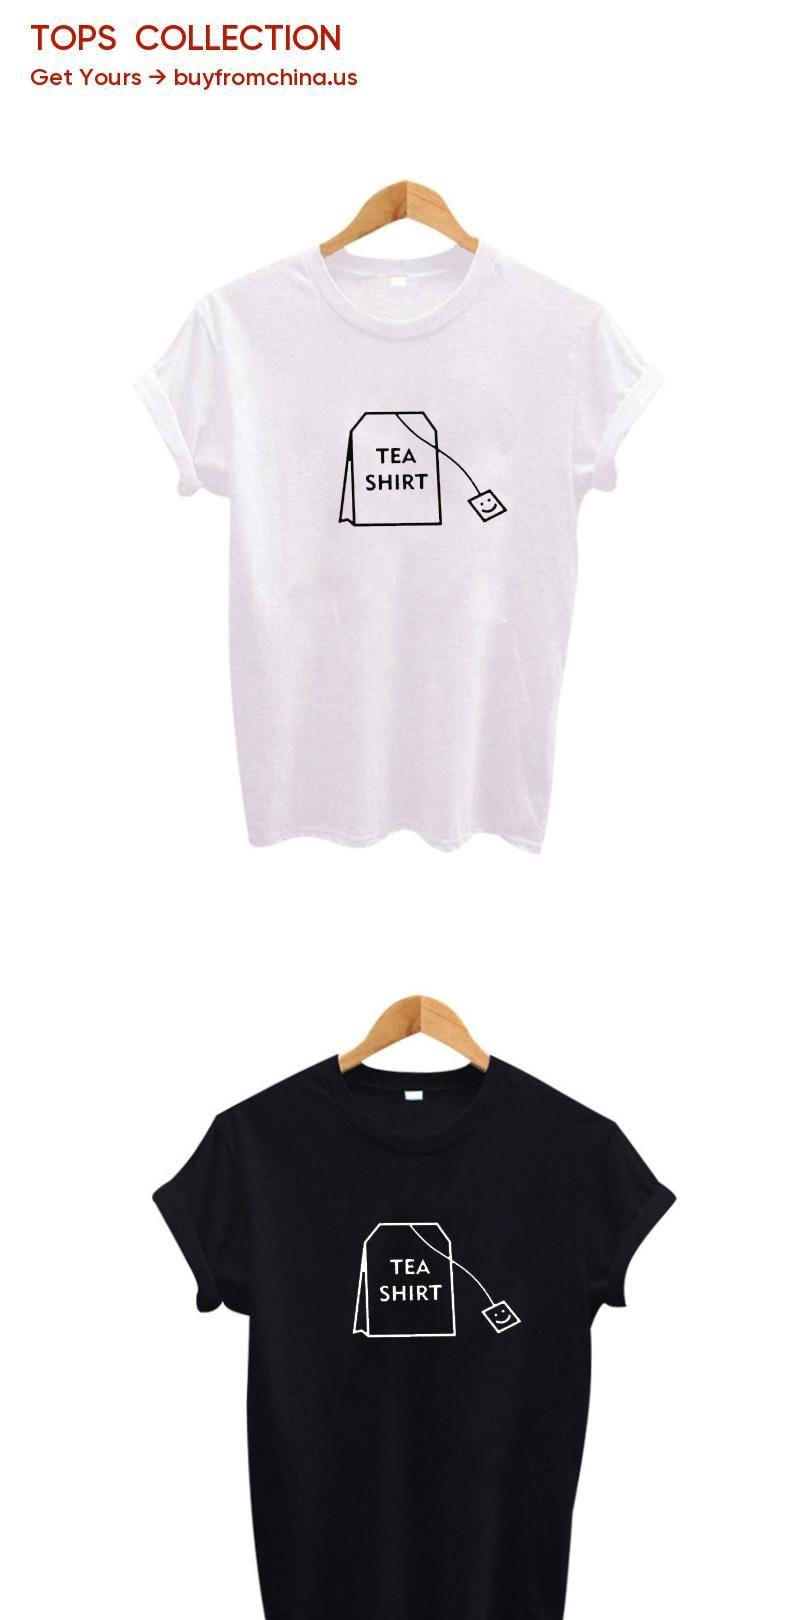 Humor Tea Shirt Graphic Tees Women Clothing 2018 Summer Funny T Shirts Harajuku Tumblr Hipster Ladies T Shirt T Shirts For Women Tea Shirt Clothes For Women